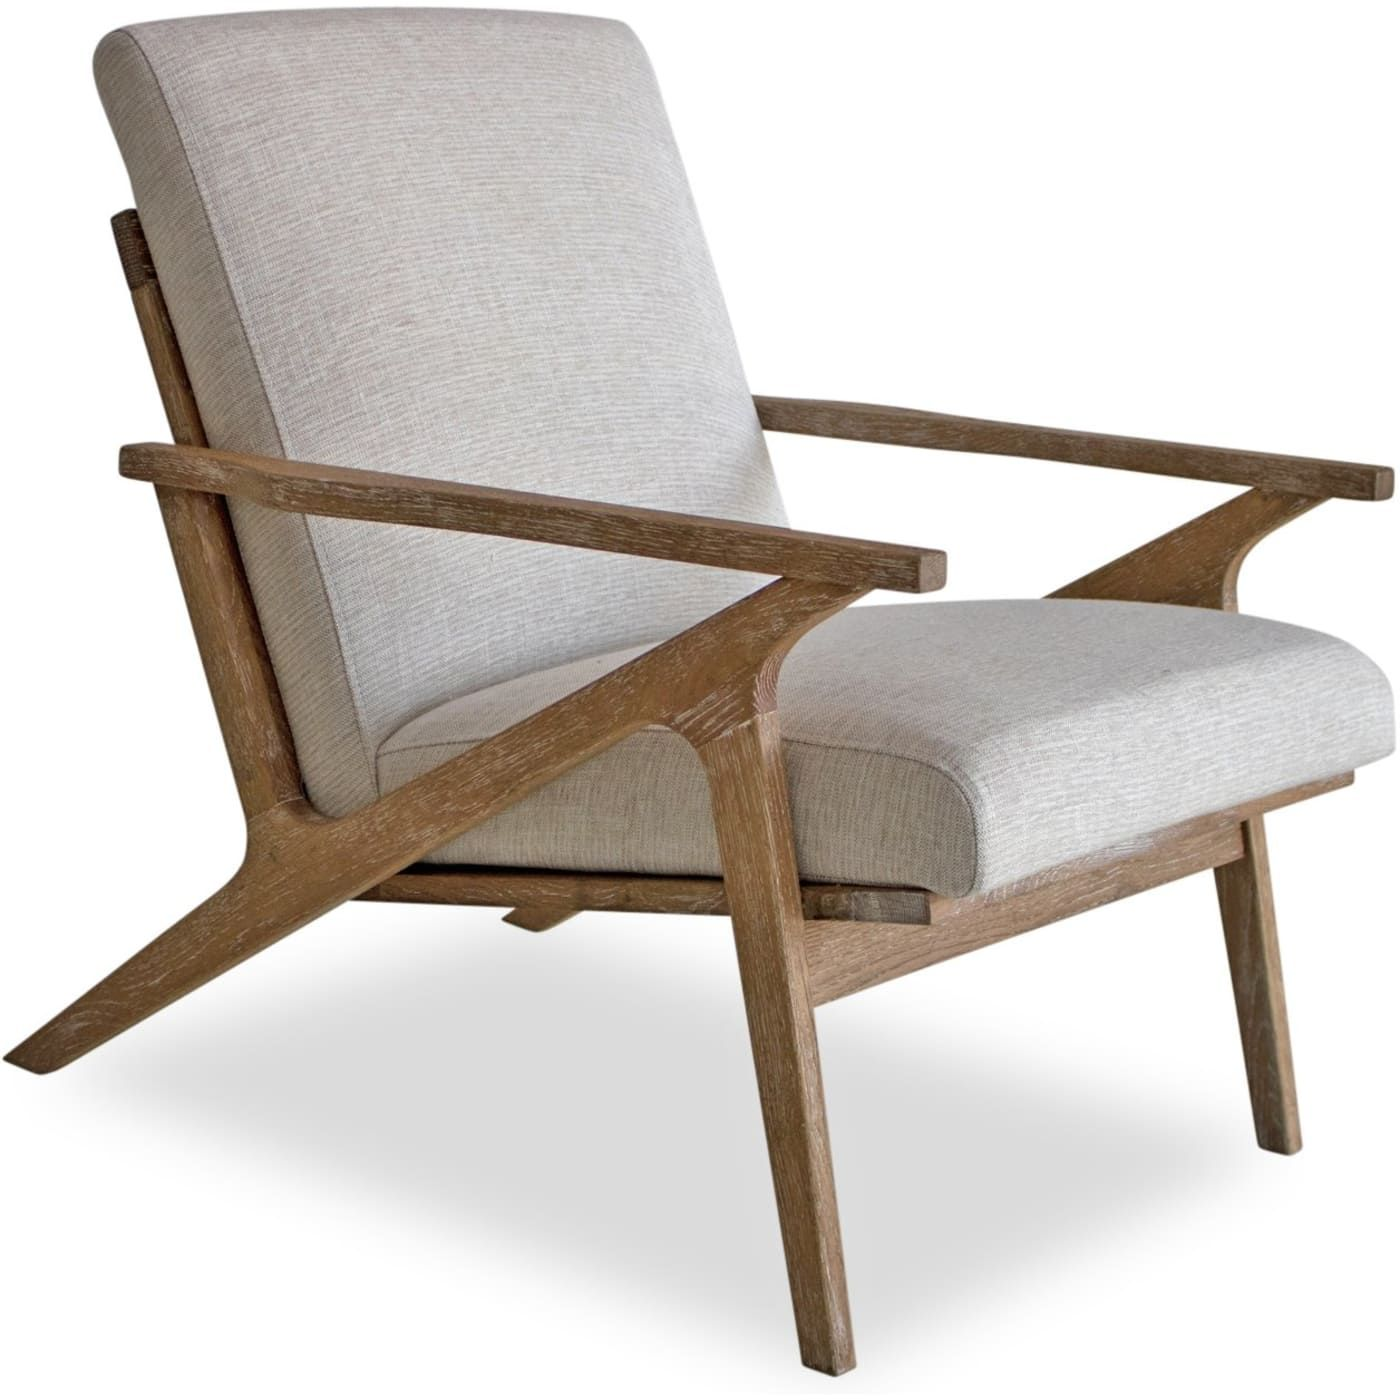 Edloe Finch Adalyn White Linen Mid Century Modern Accent Chair